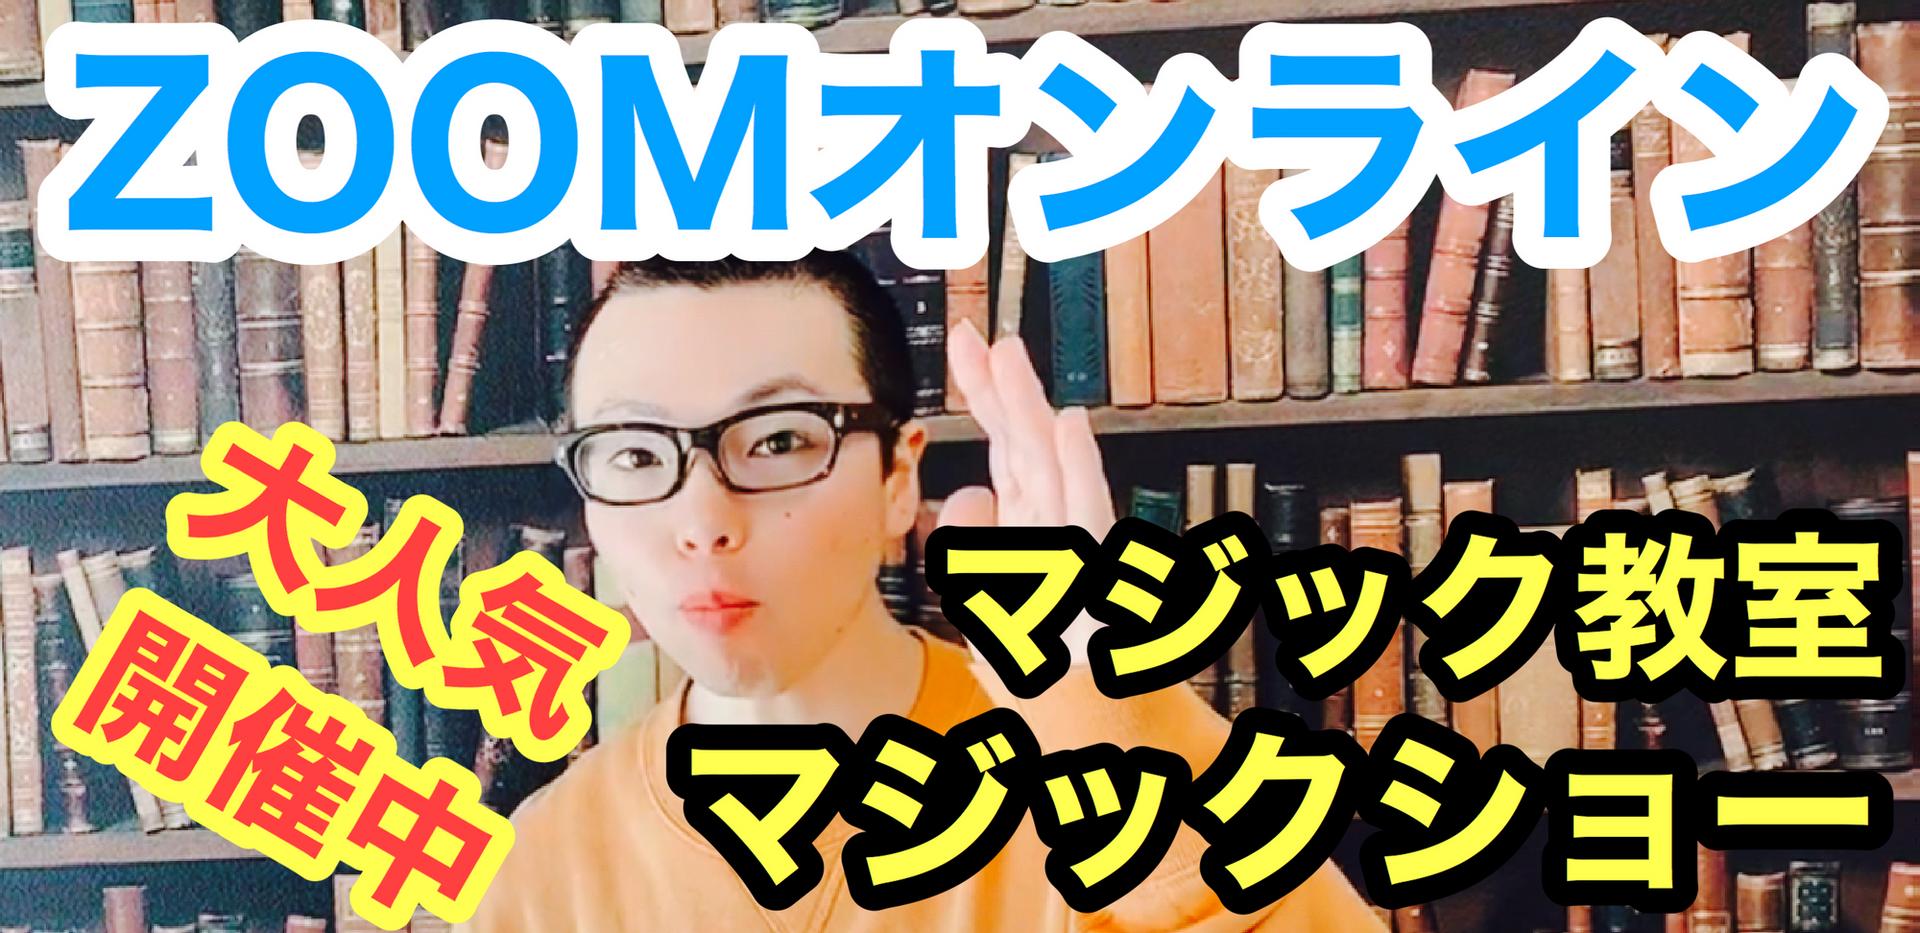 ZOOMオンラインマジックショー&マジック教室